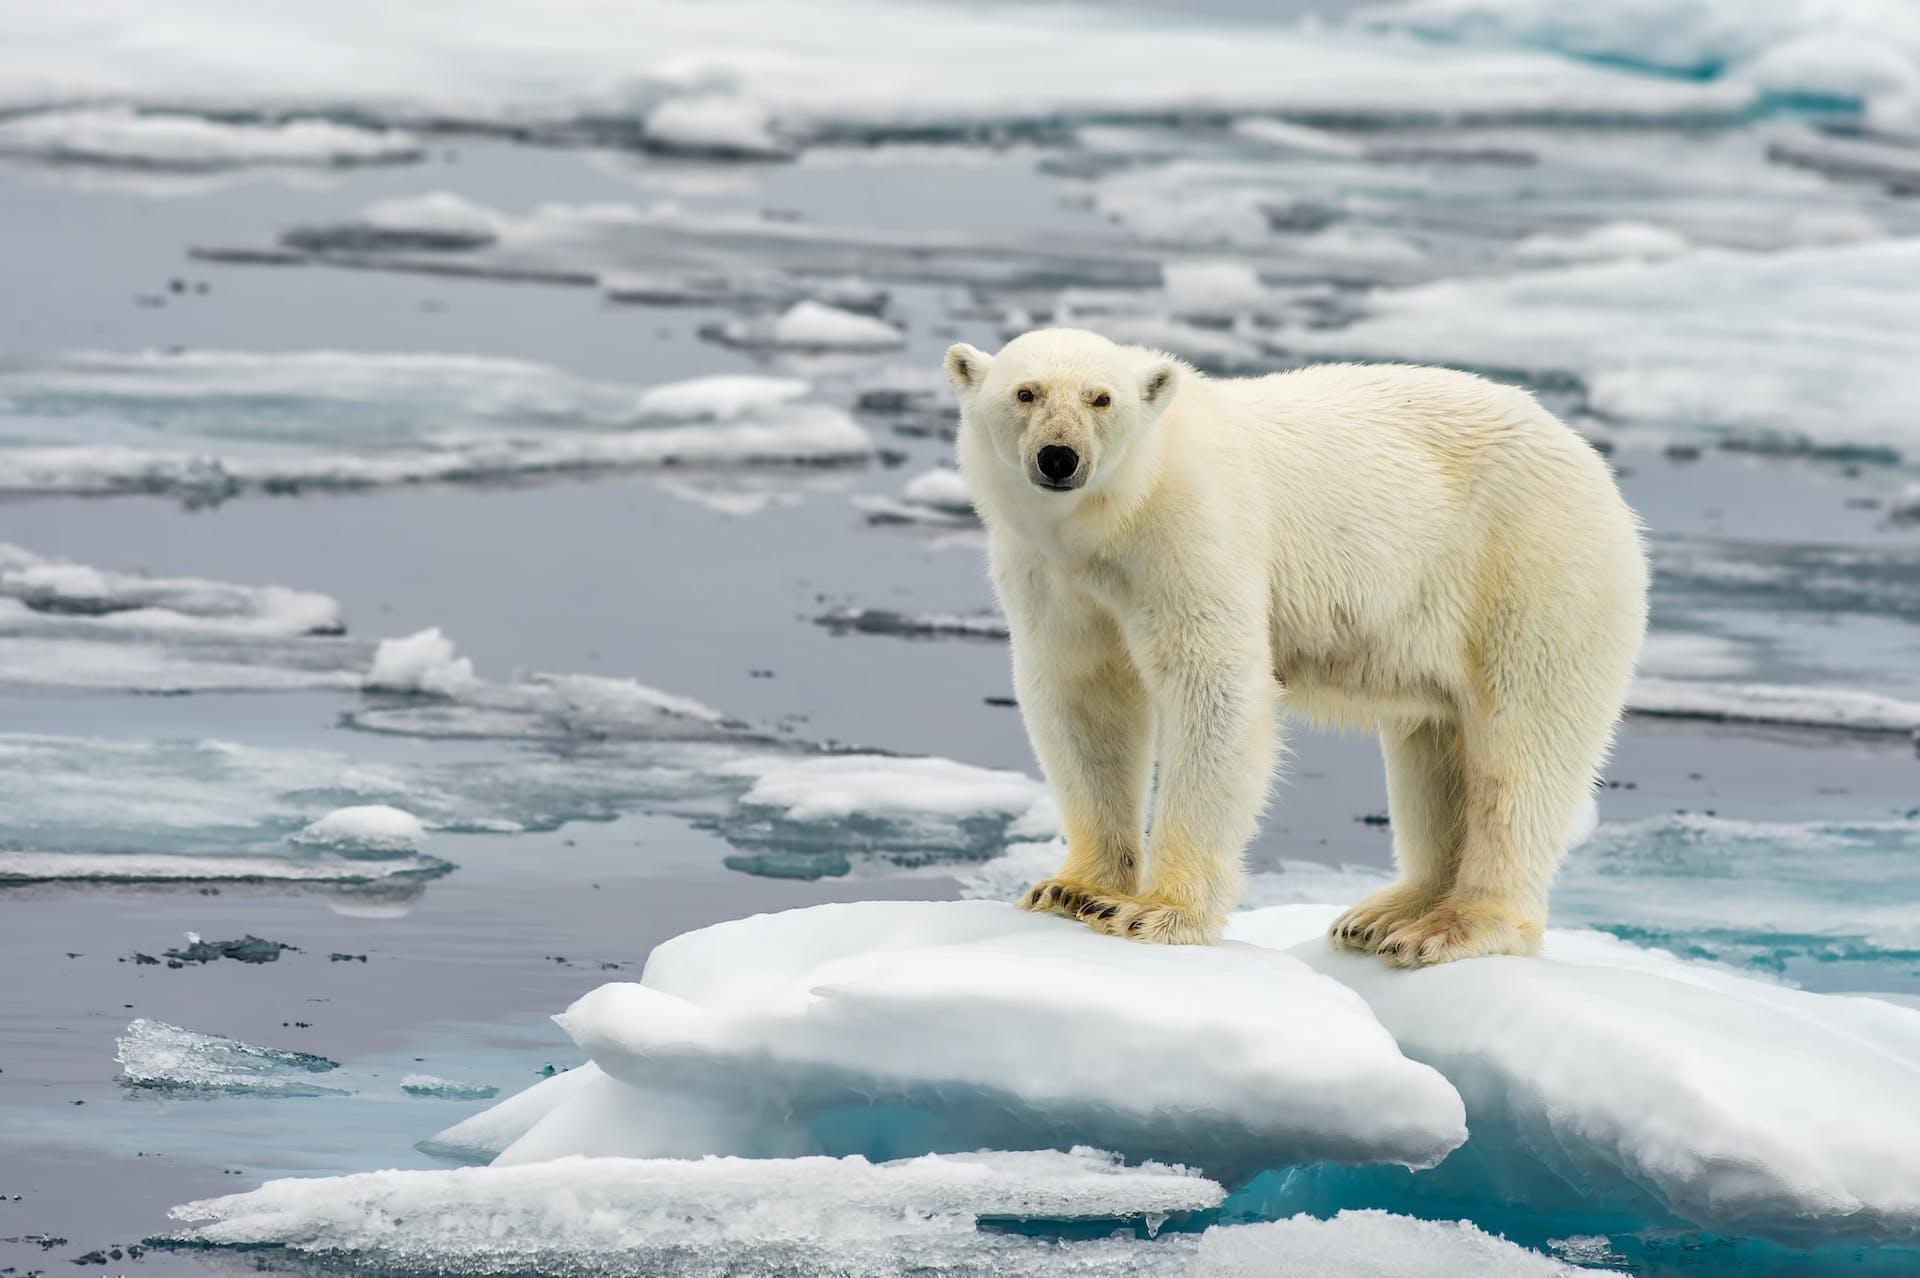 Den globale opvarmning - Isbjørn